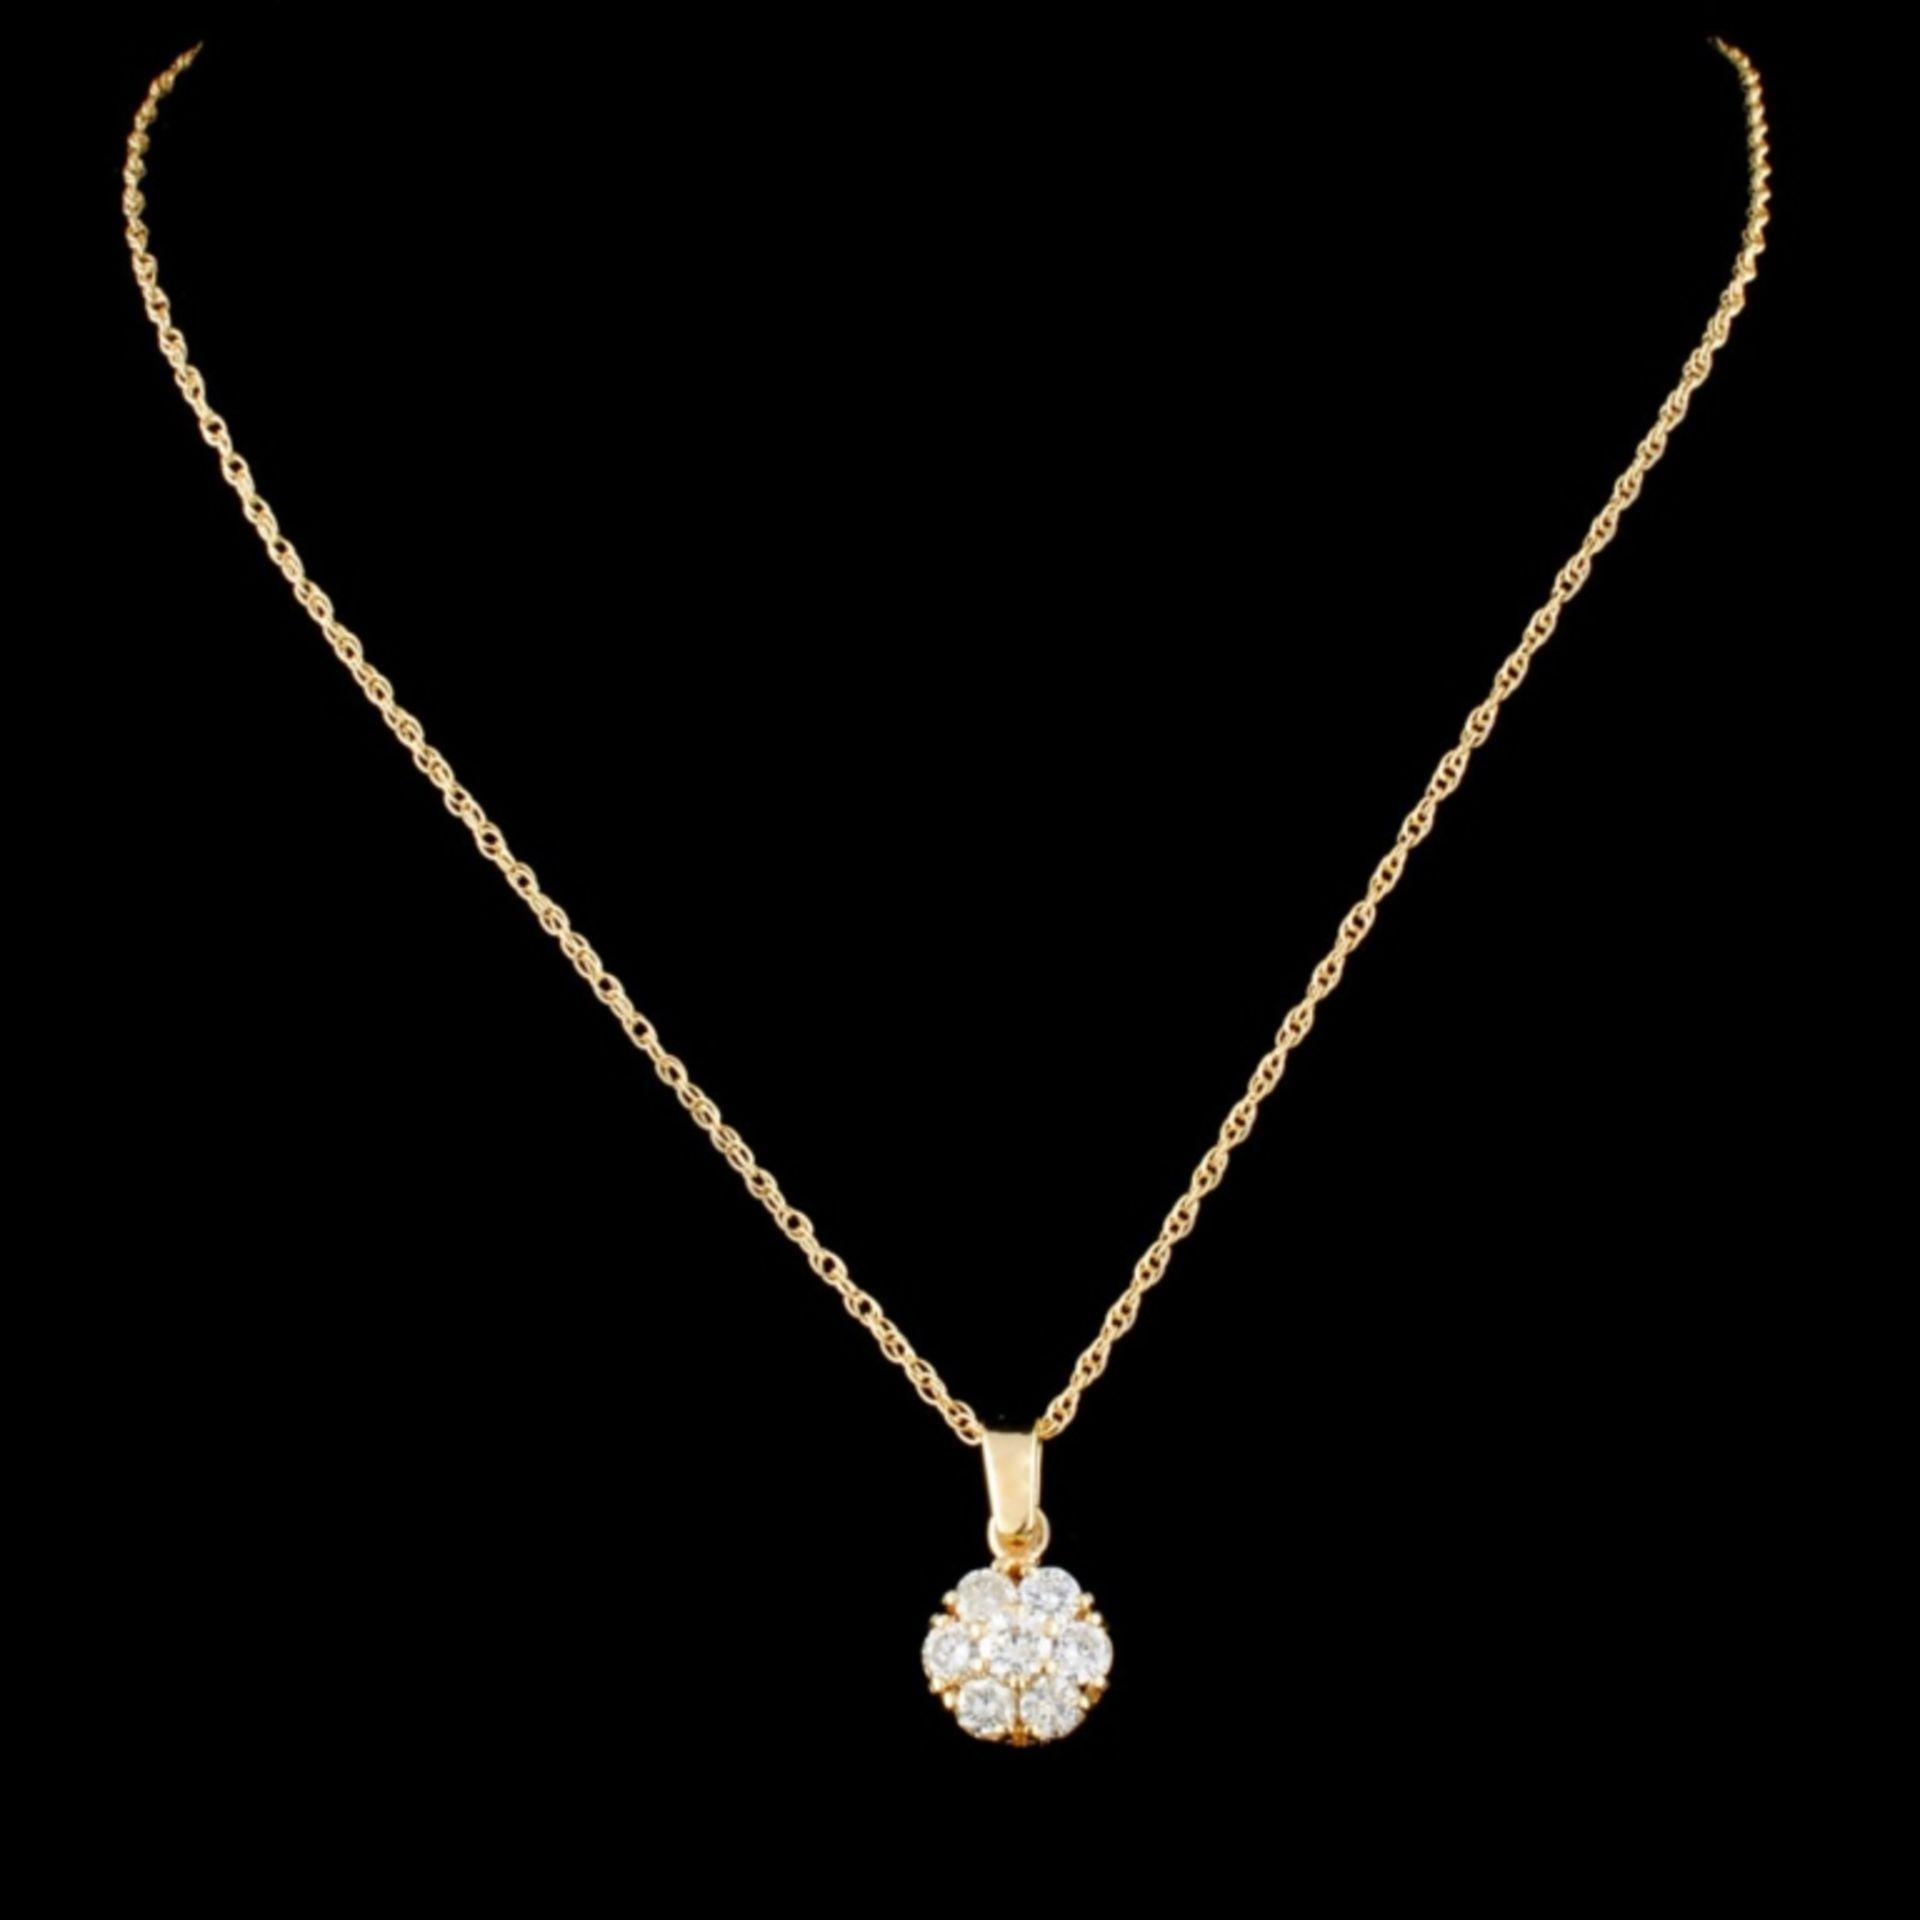 14K Gold 0.44ctw Diamond Pendant - Image 2 of 4